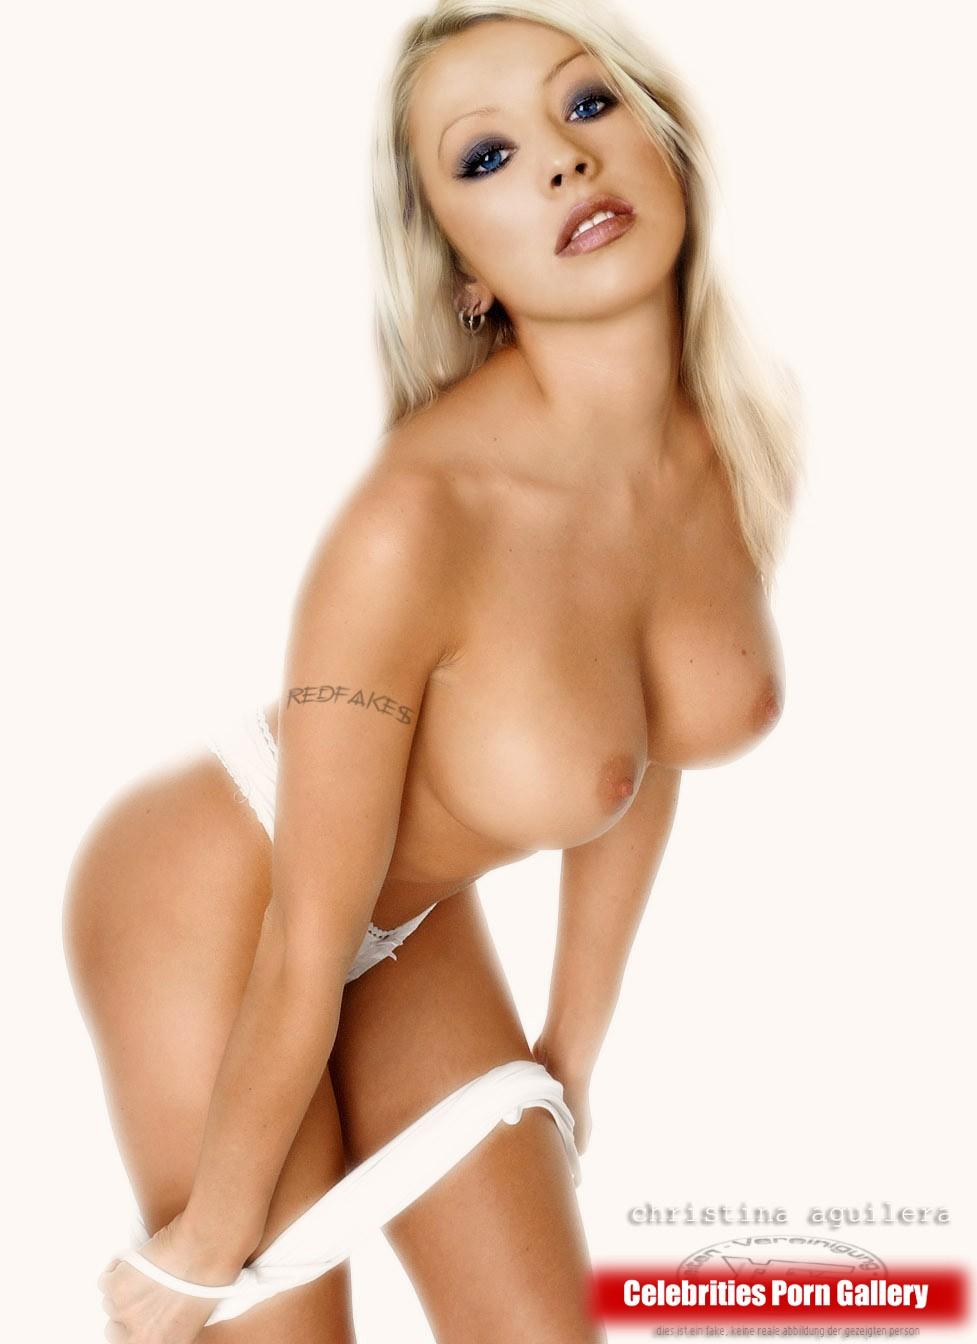 Christina aguilera nude album cover a bid to avoid fashion statement